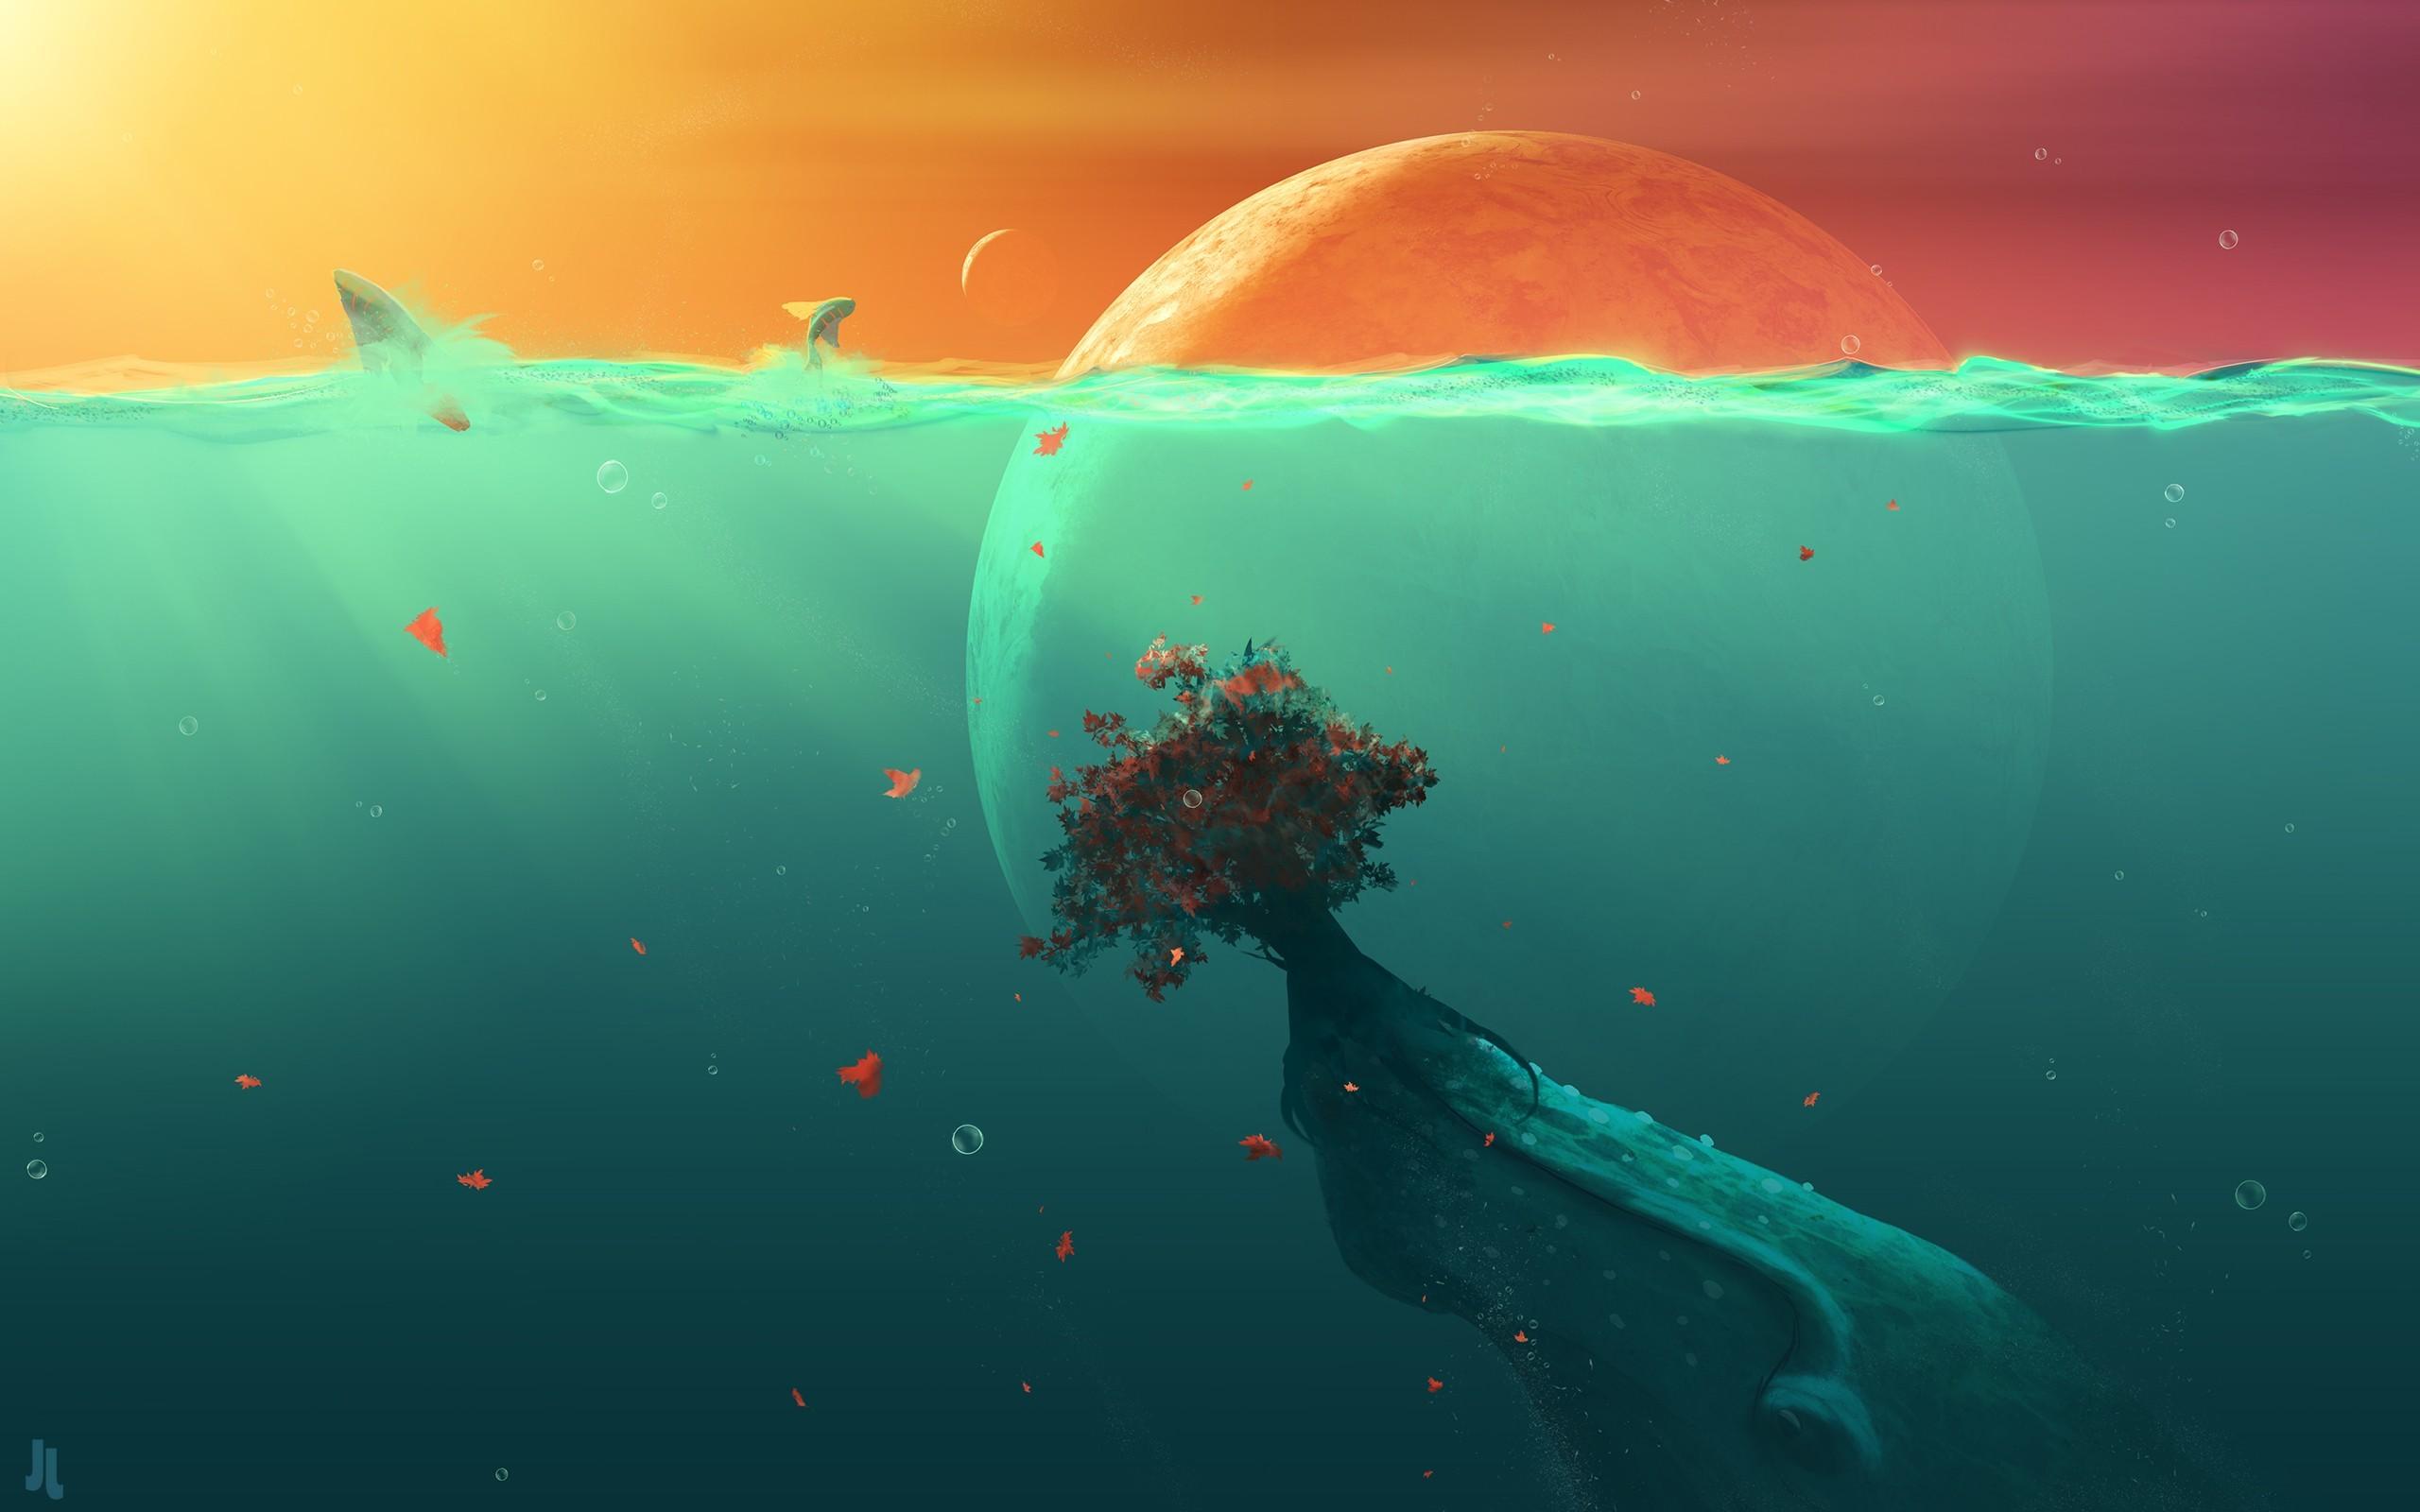 Hd Wallpapers 1080p Ocean: Deep Sea Desktop Wallpaper (67+ Images